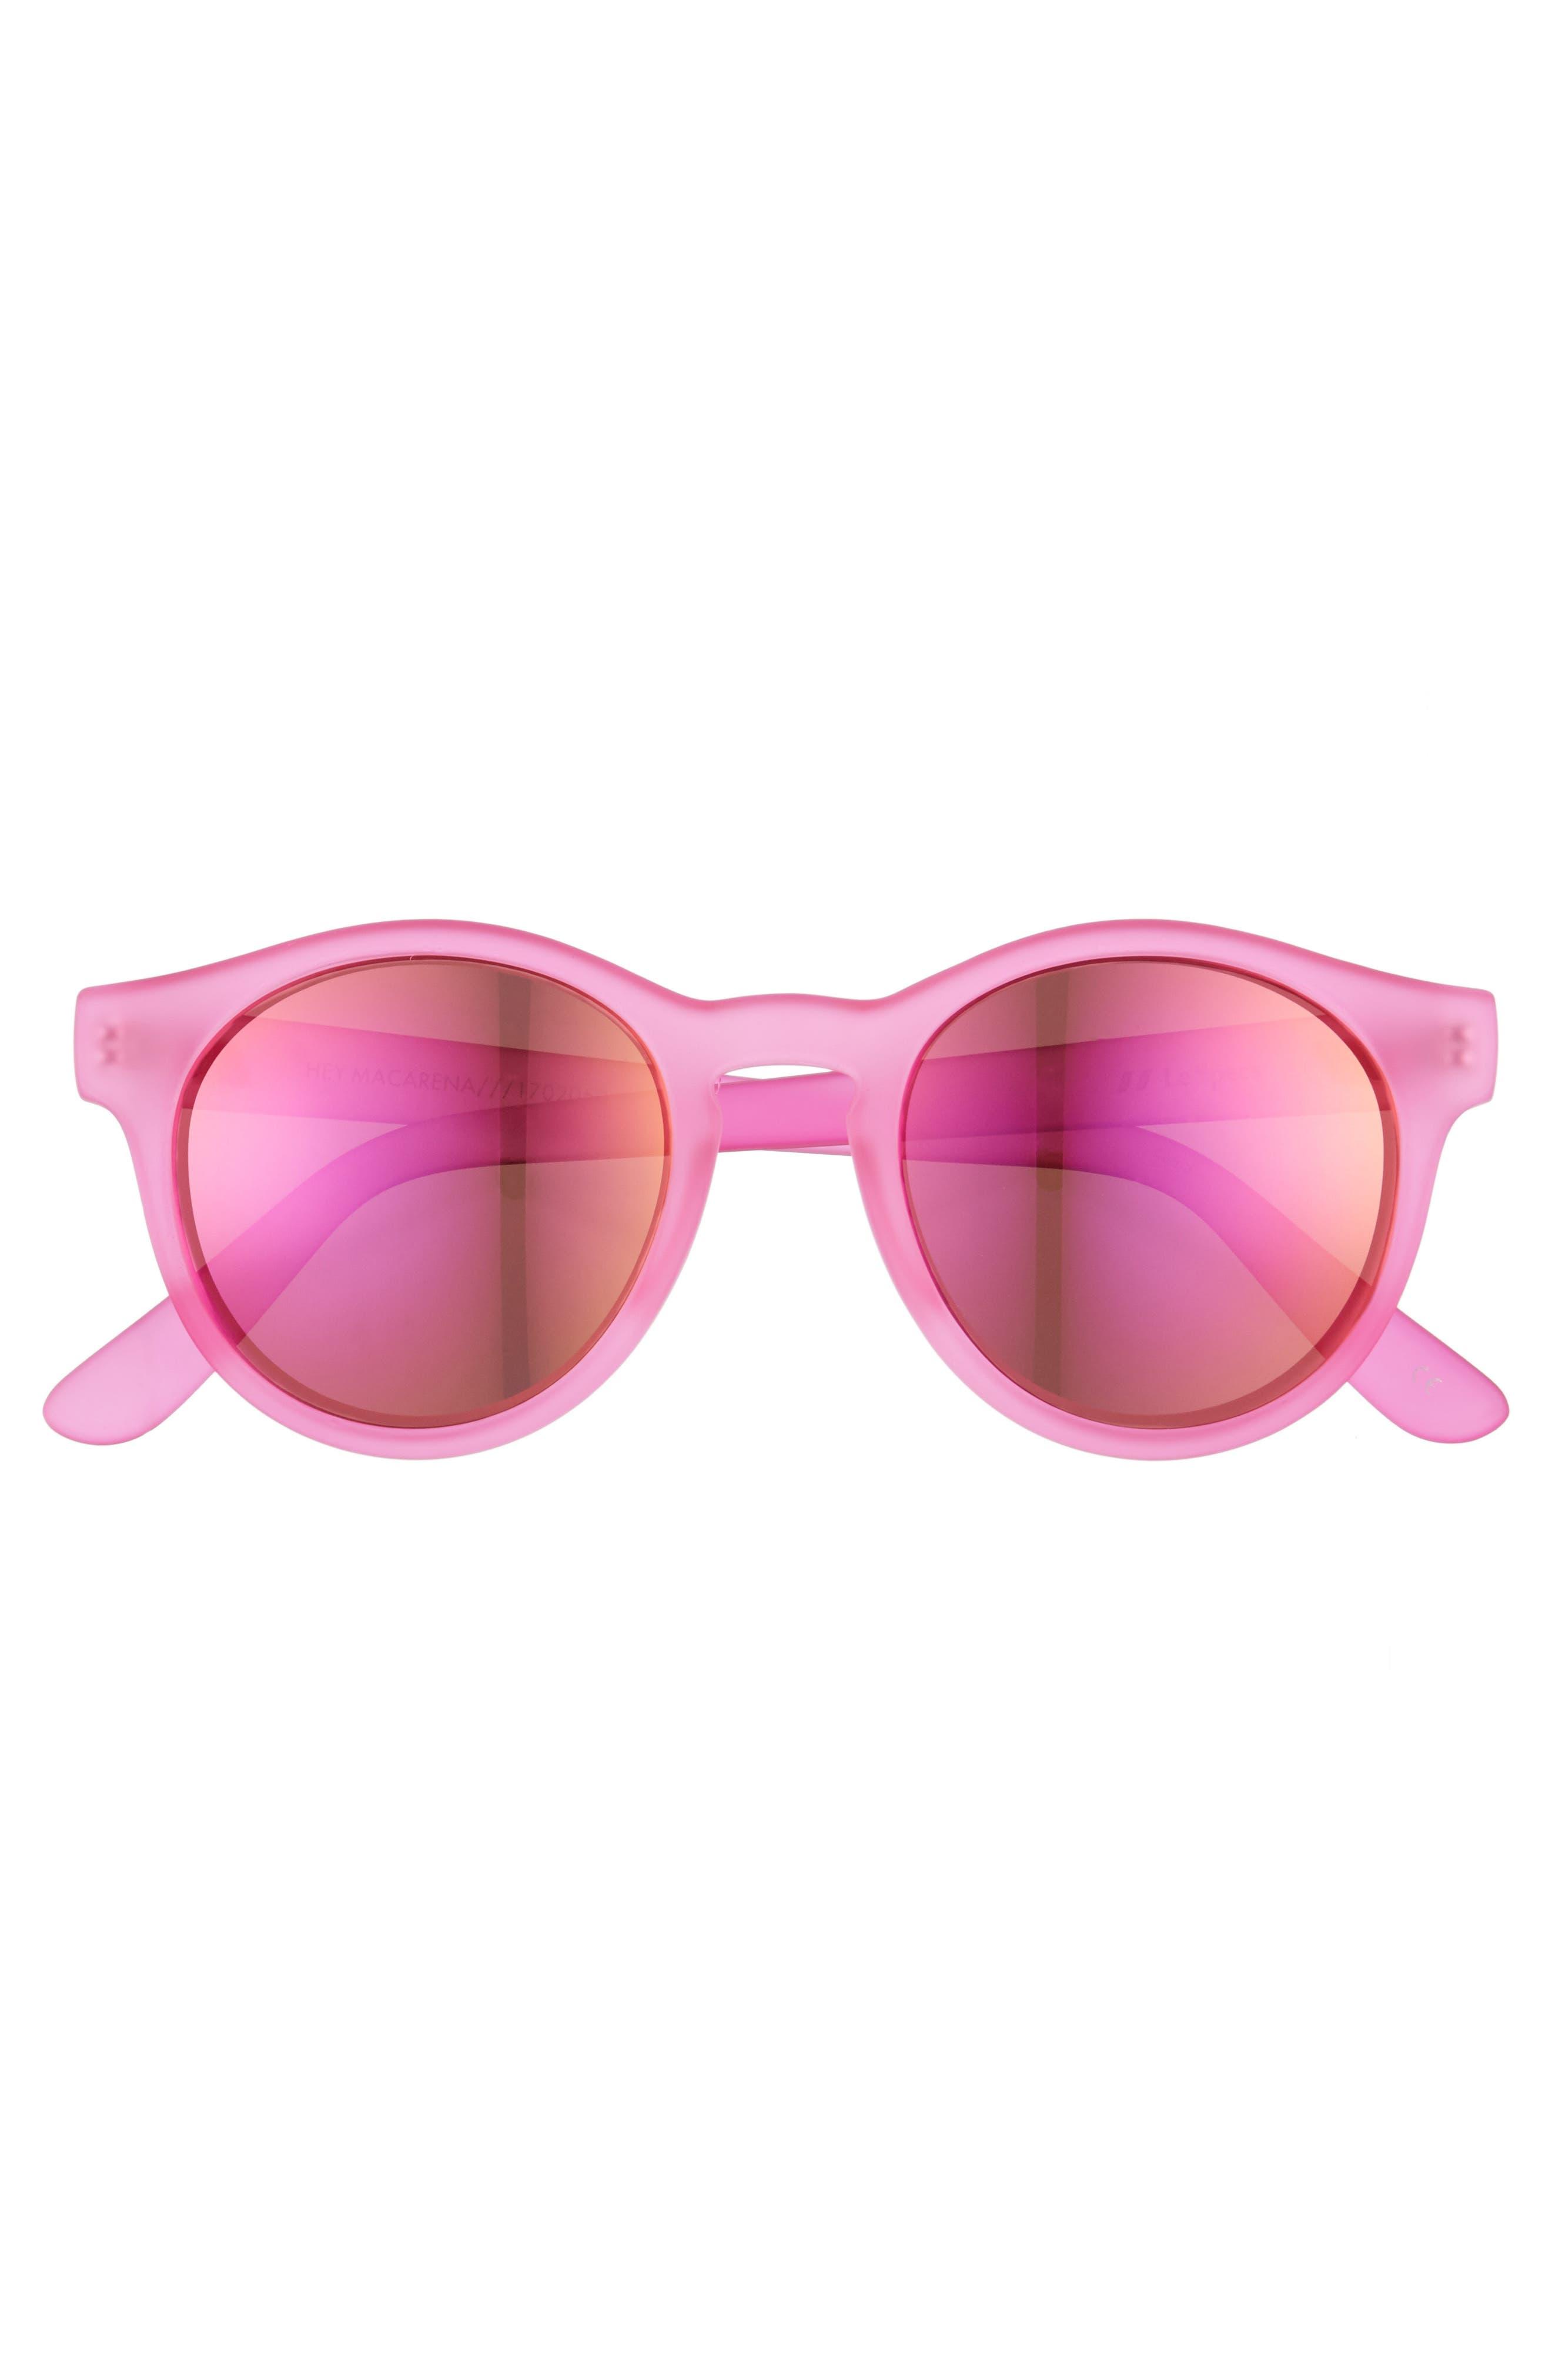 Hey Macarena 51mm Round Sunglasses,                             Alternate thumbnail 3, color,                             650